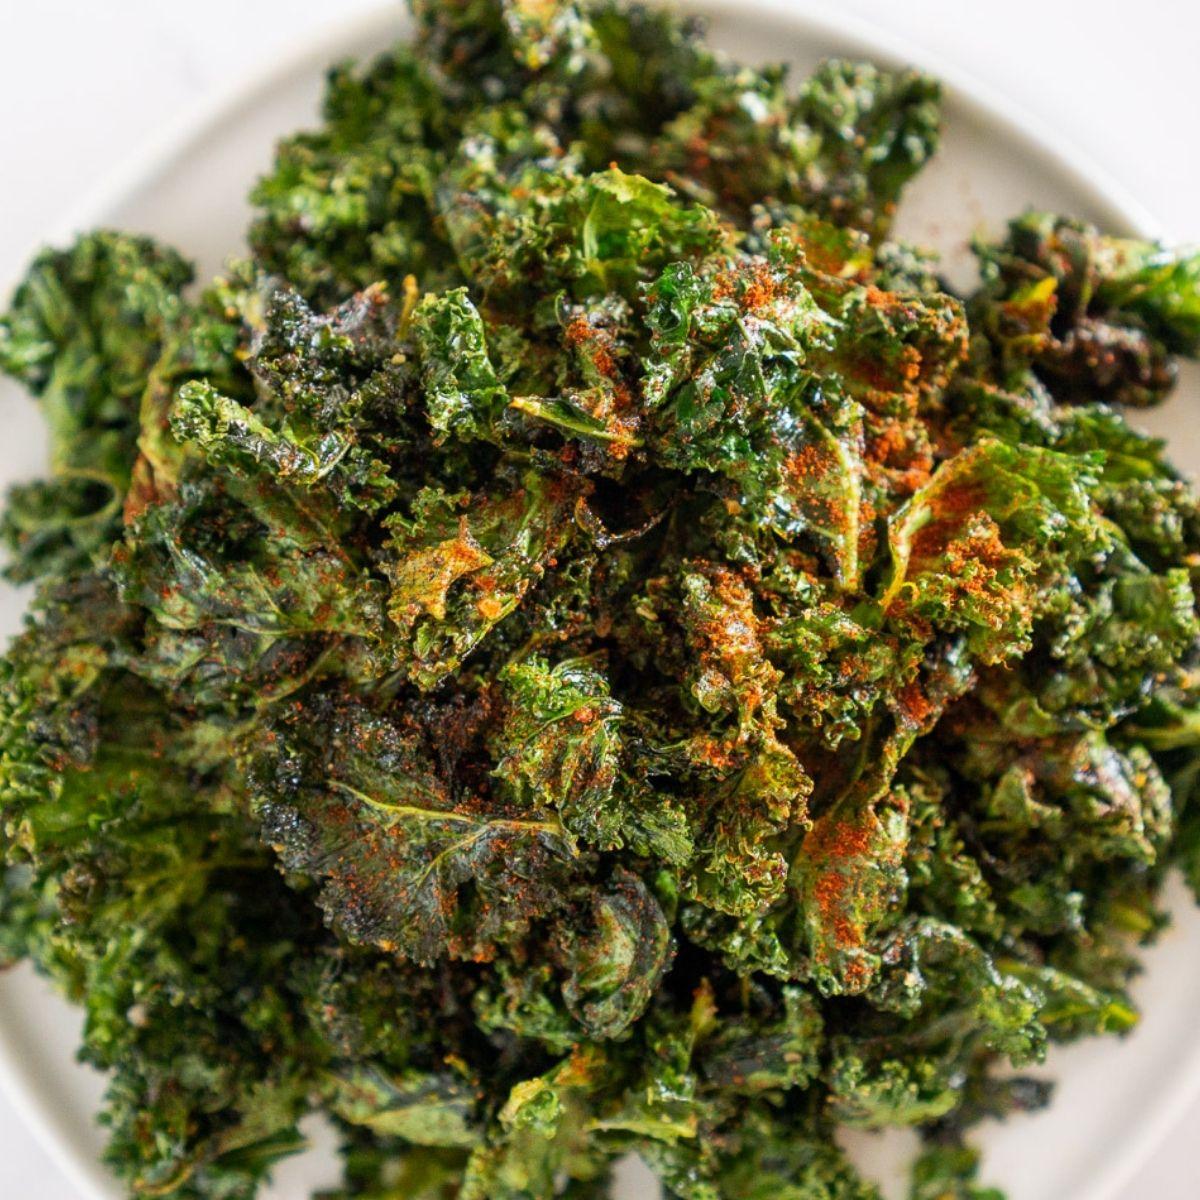 Plate of crispy kale chips seasoned with Cajun spice.